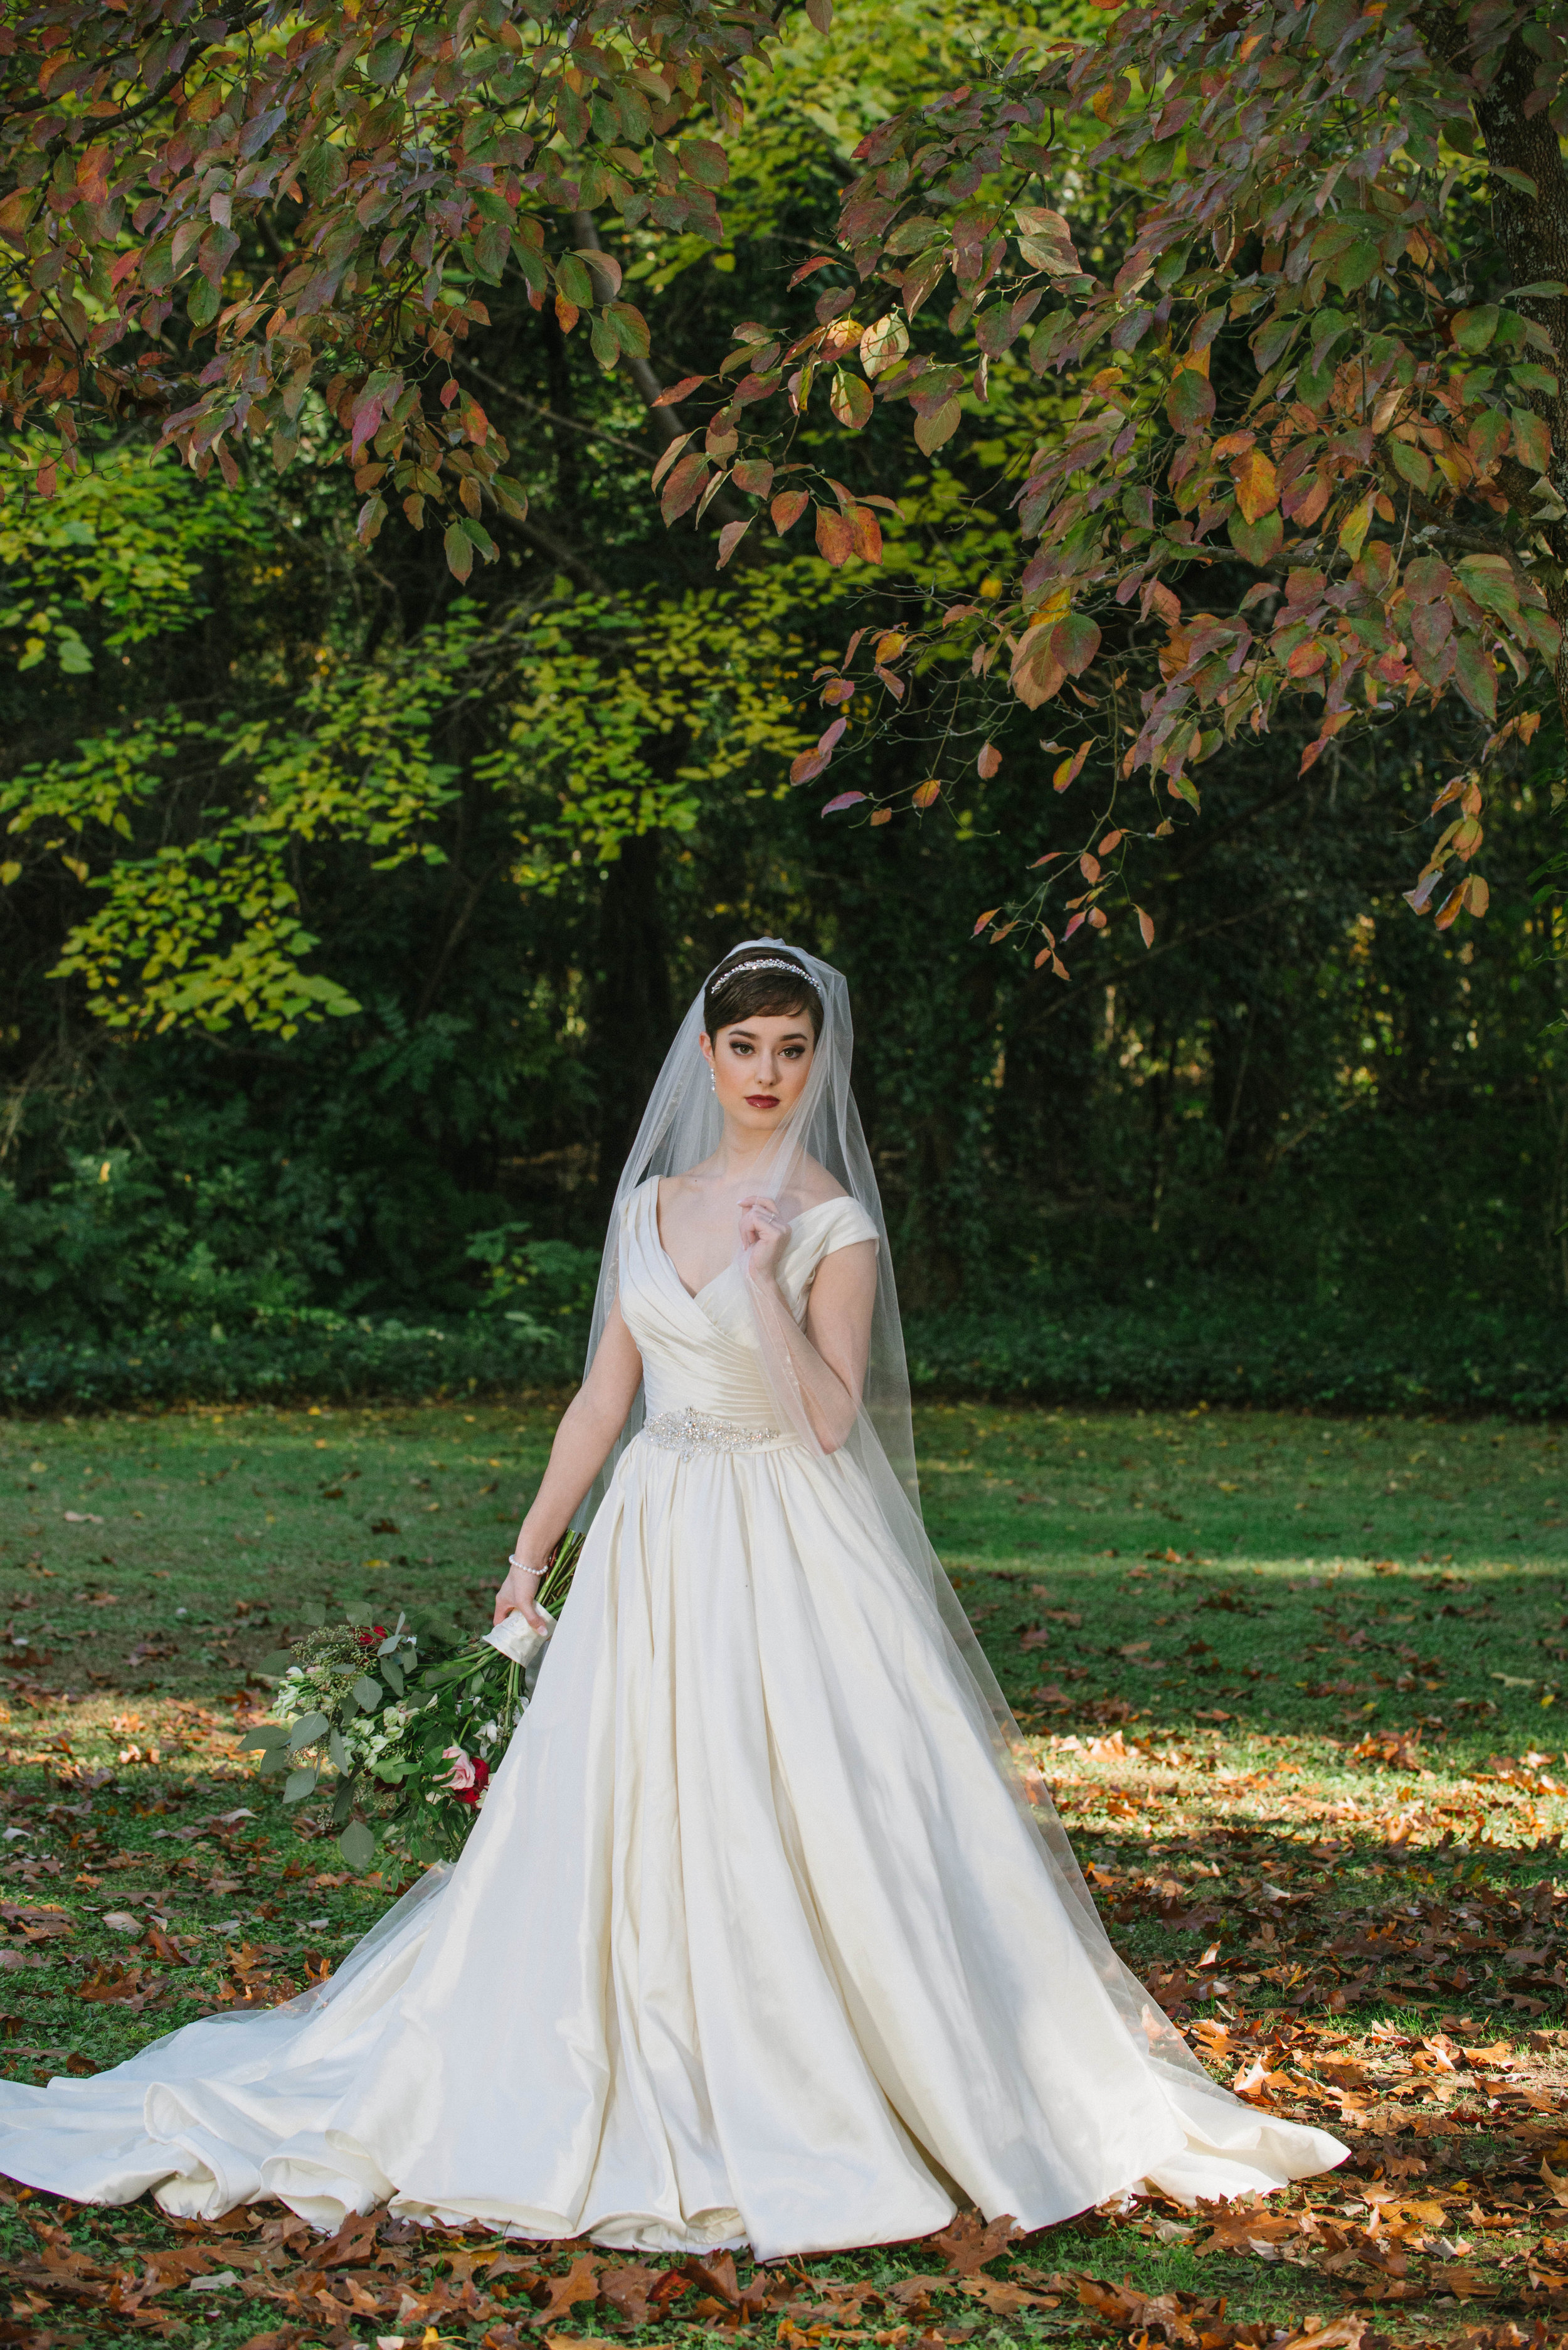 CarolineMerritt|Bridals|_Color_MiraPhotographs-42.jpg